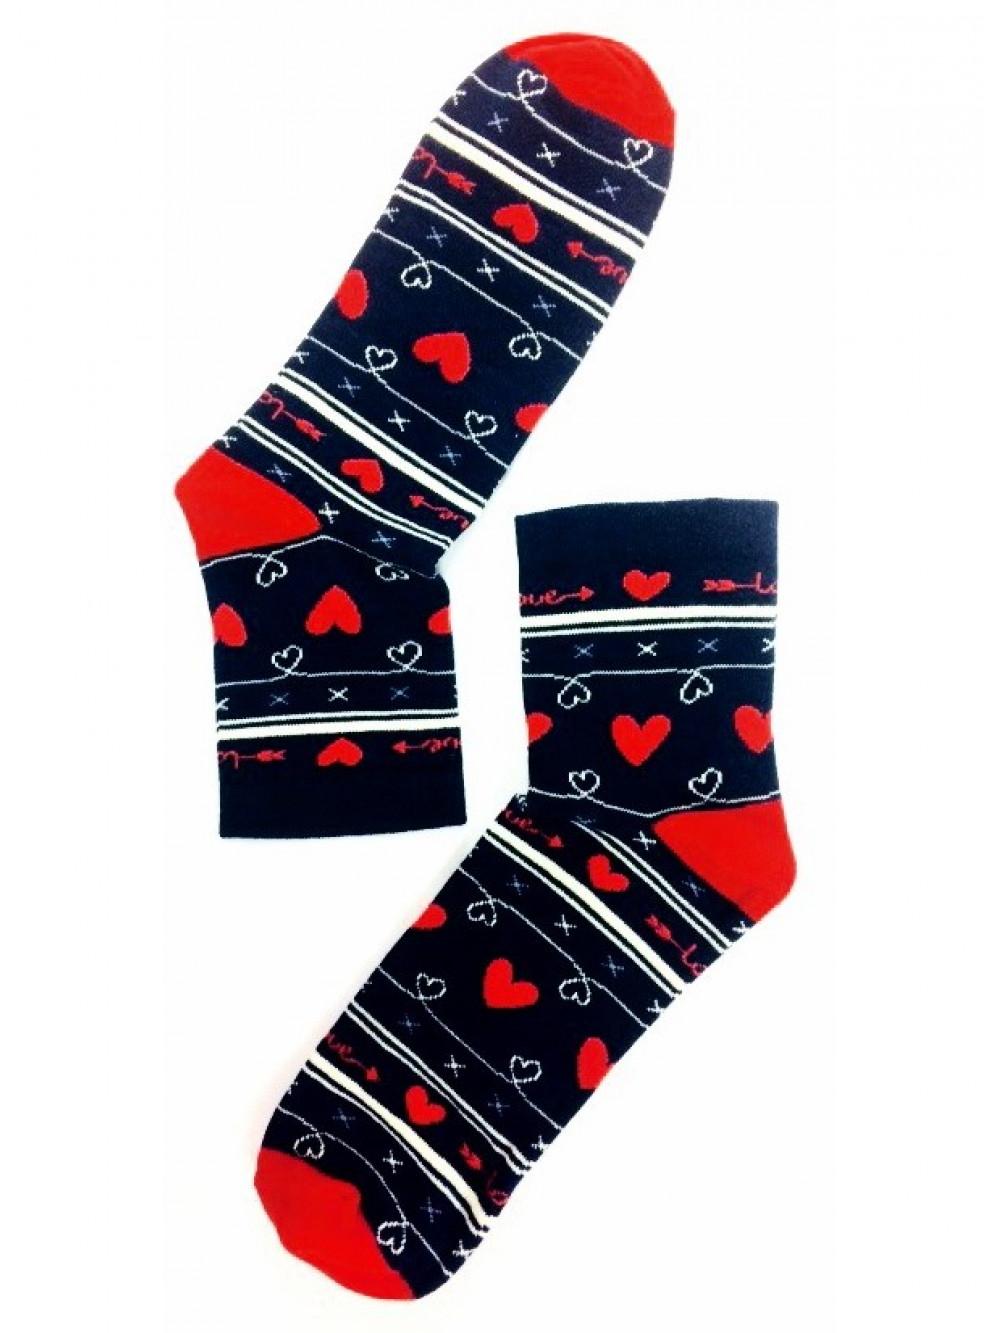 Dámske ponožky Stepa Heart čierne